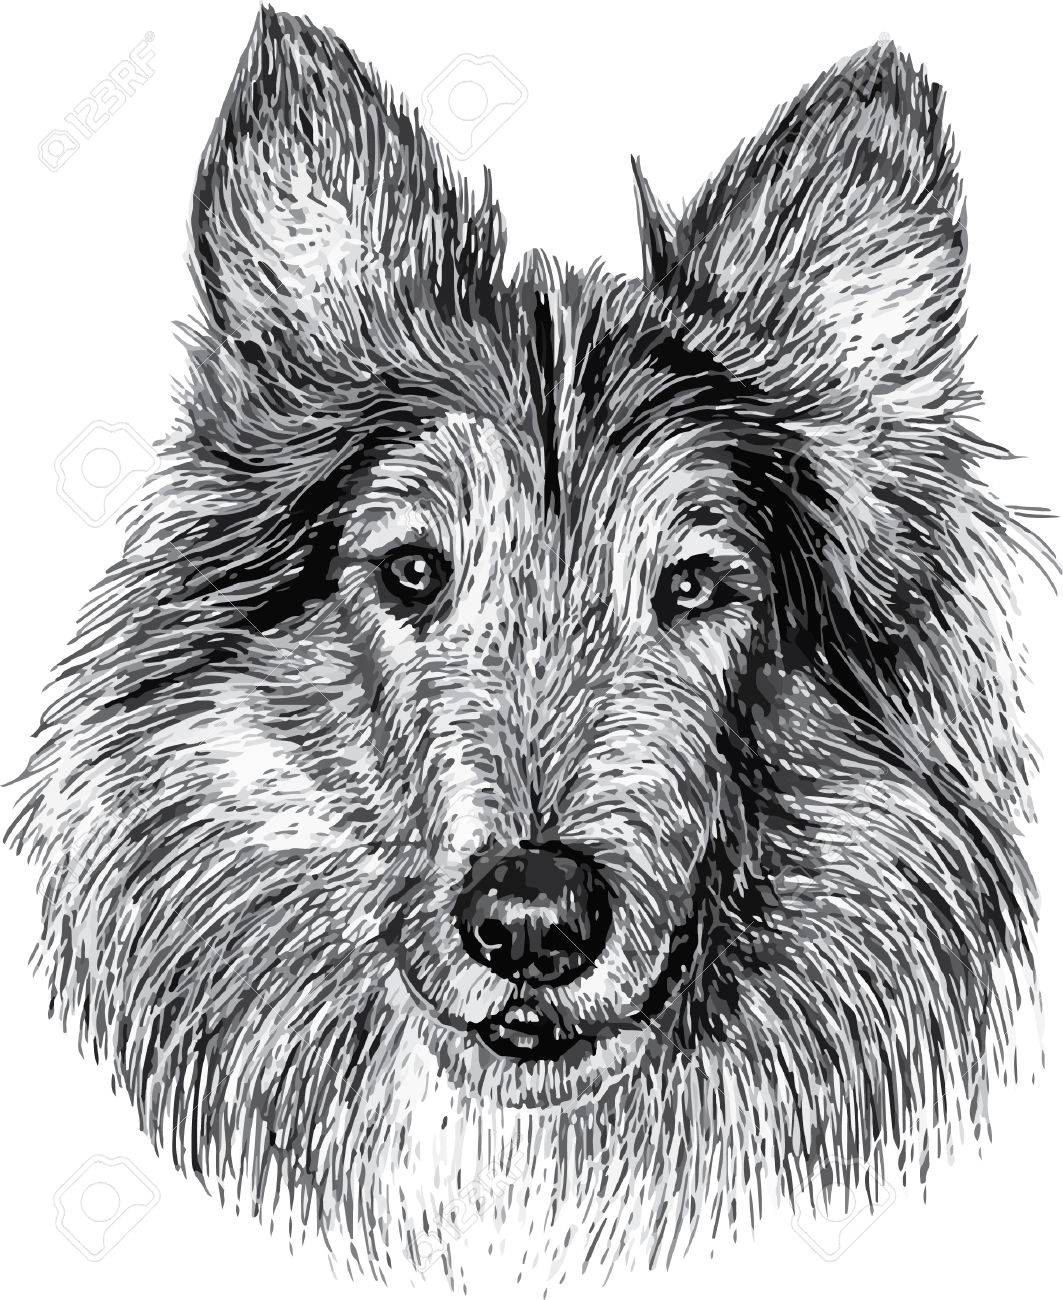 Dog head draw monochrome illustration on white background